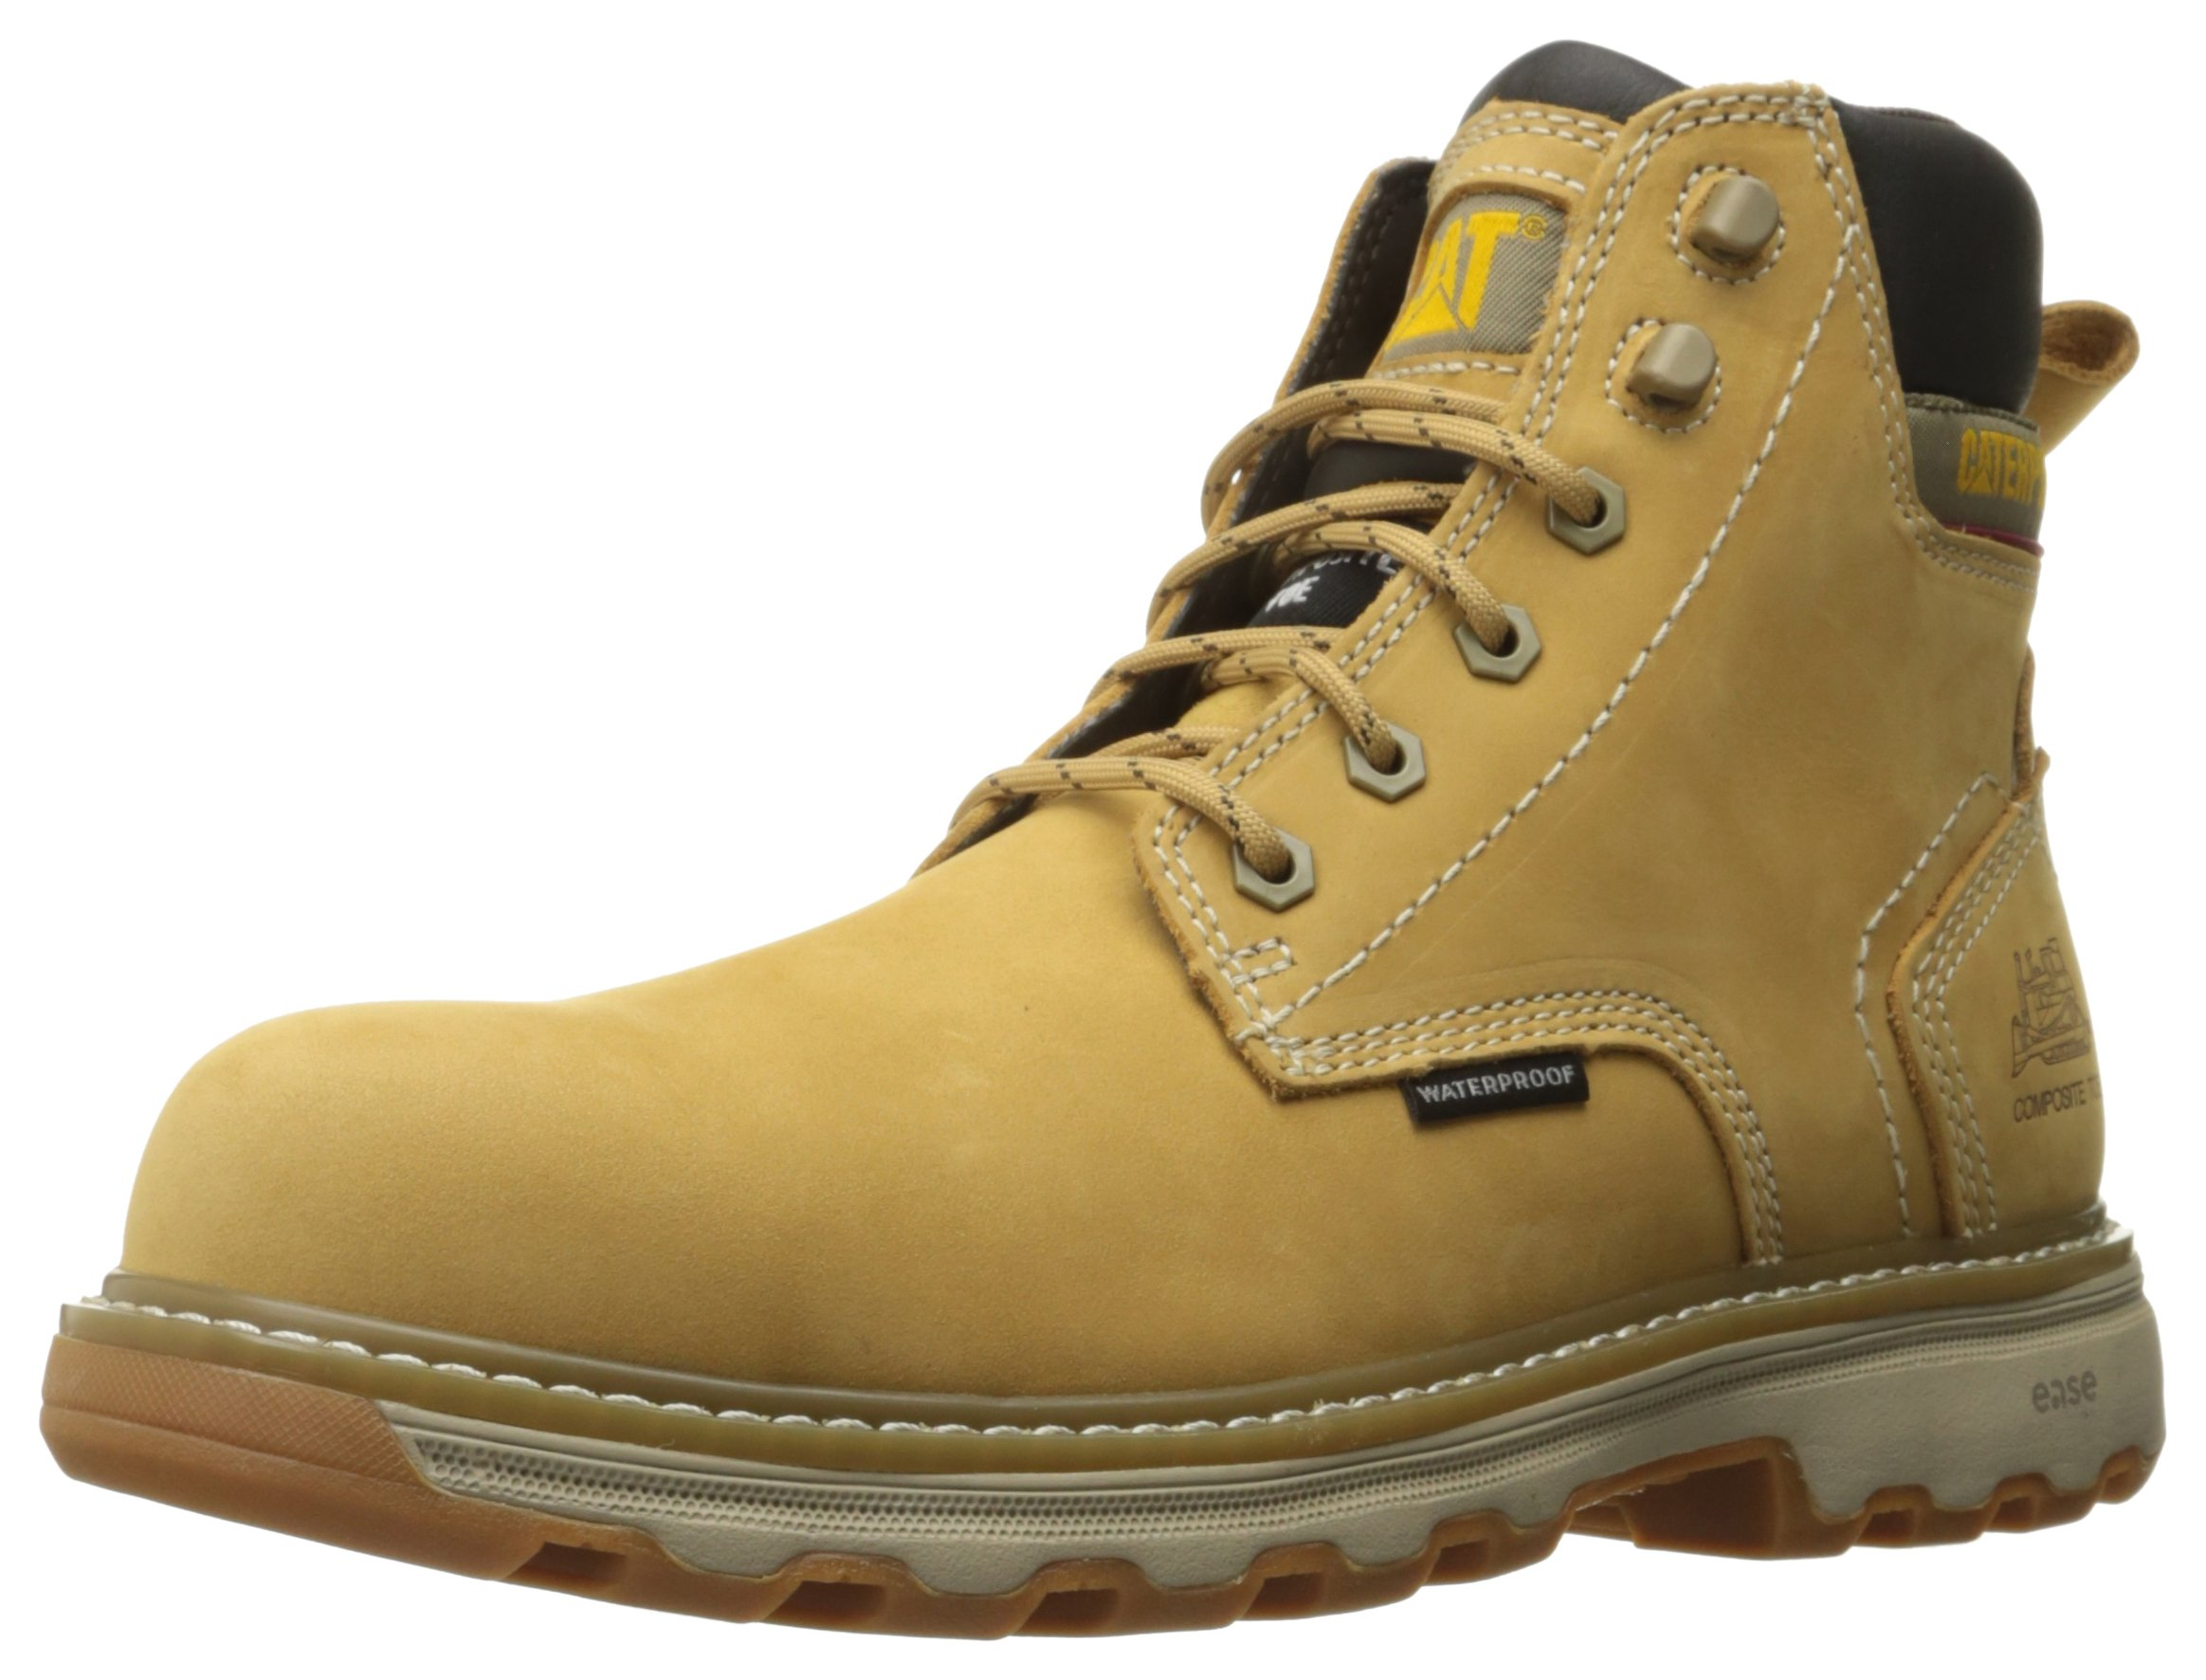 Caterpillar Men's Precision Comp Toe Waterproof Work Boot, Honey Reset, 11 W US